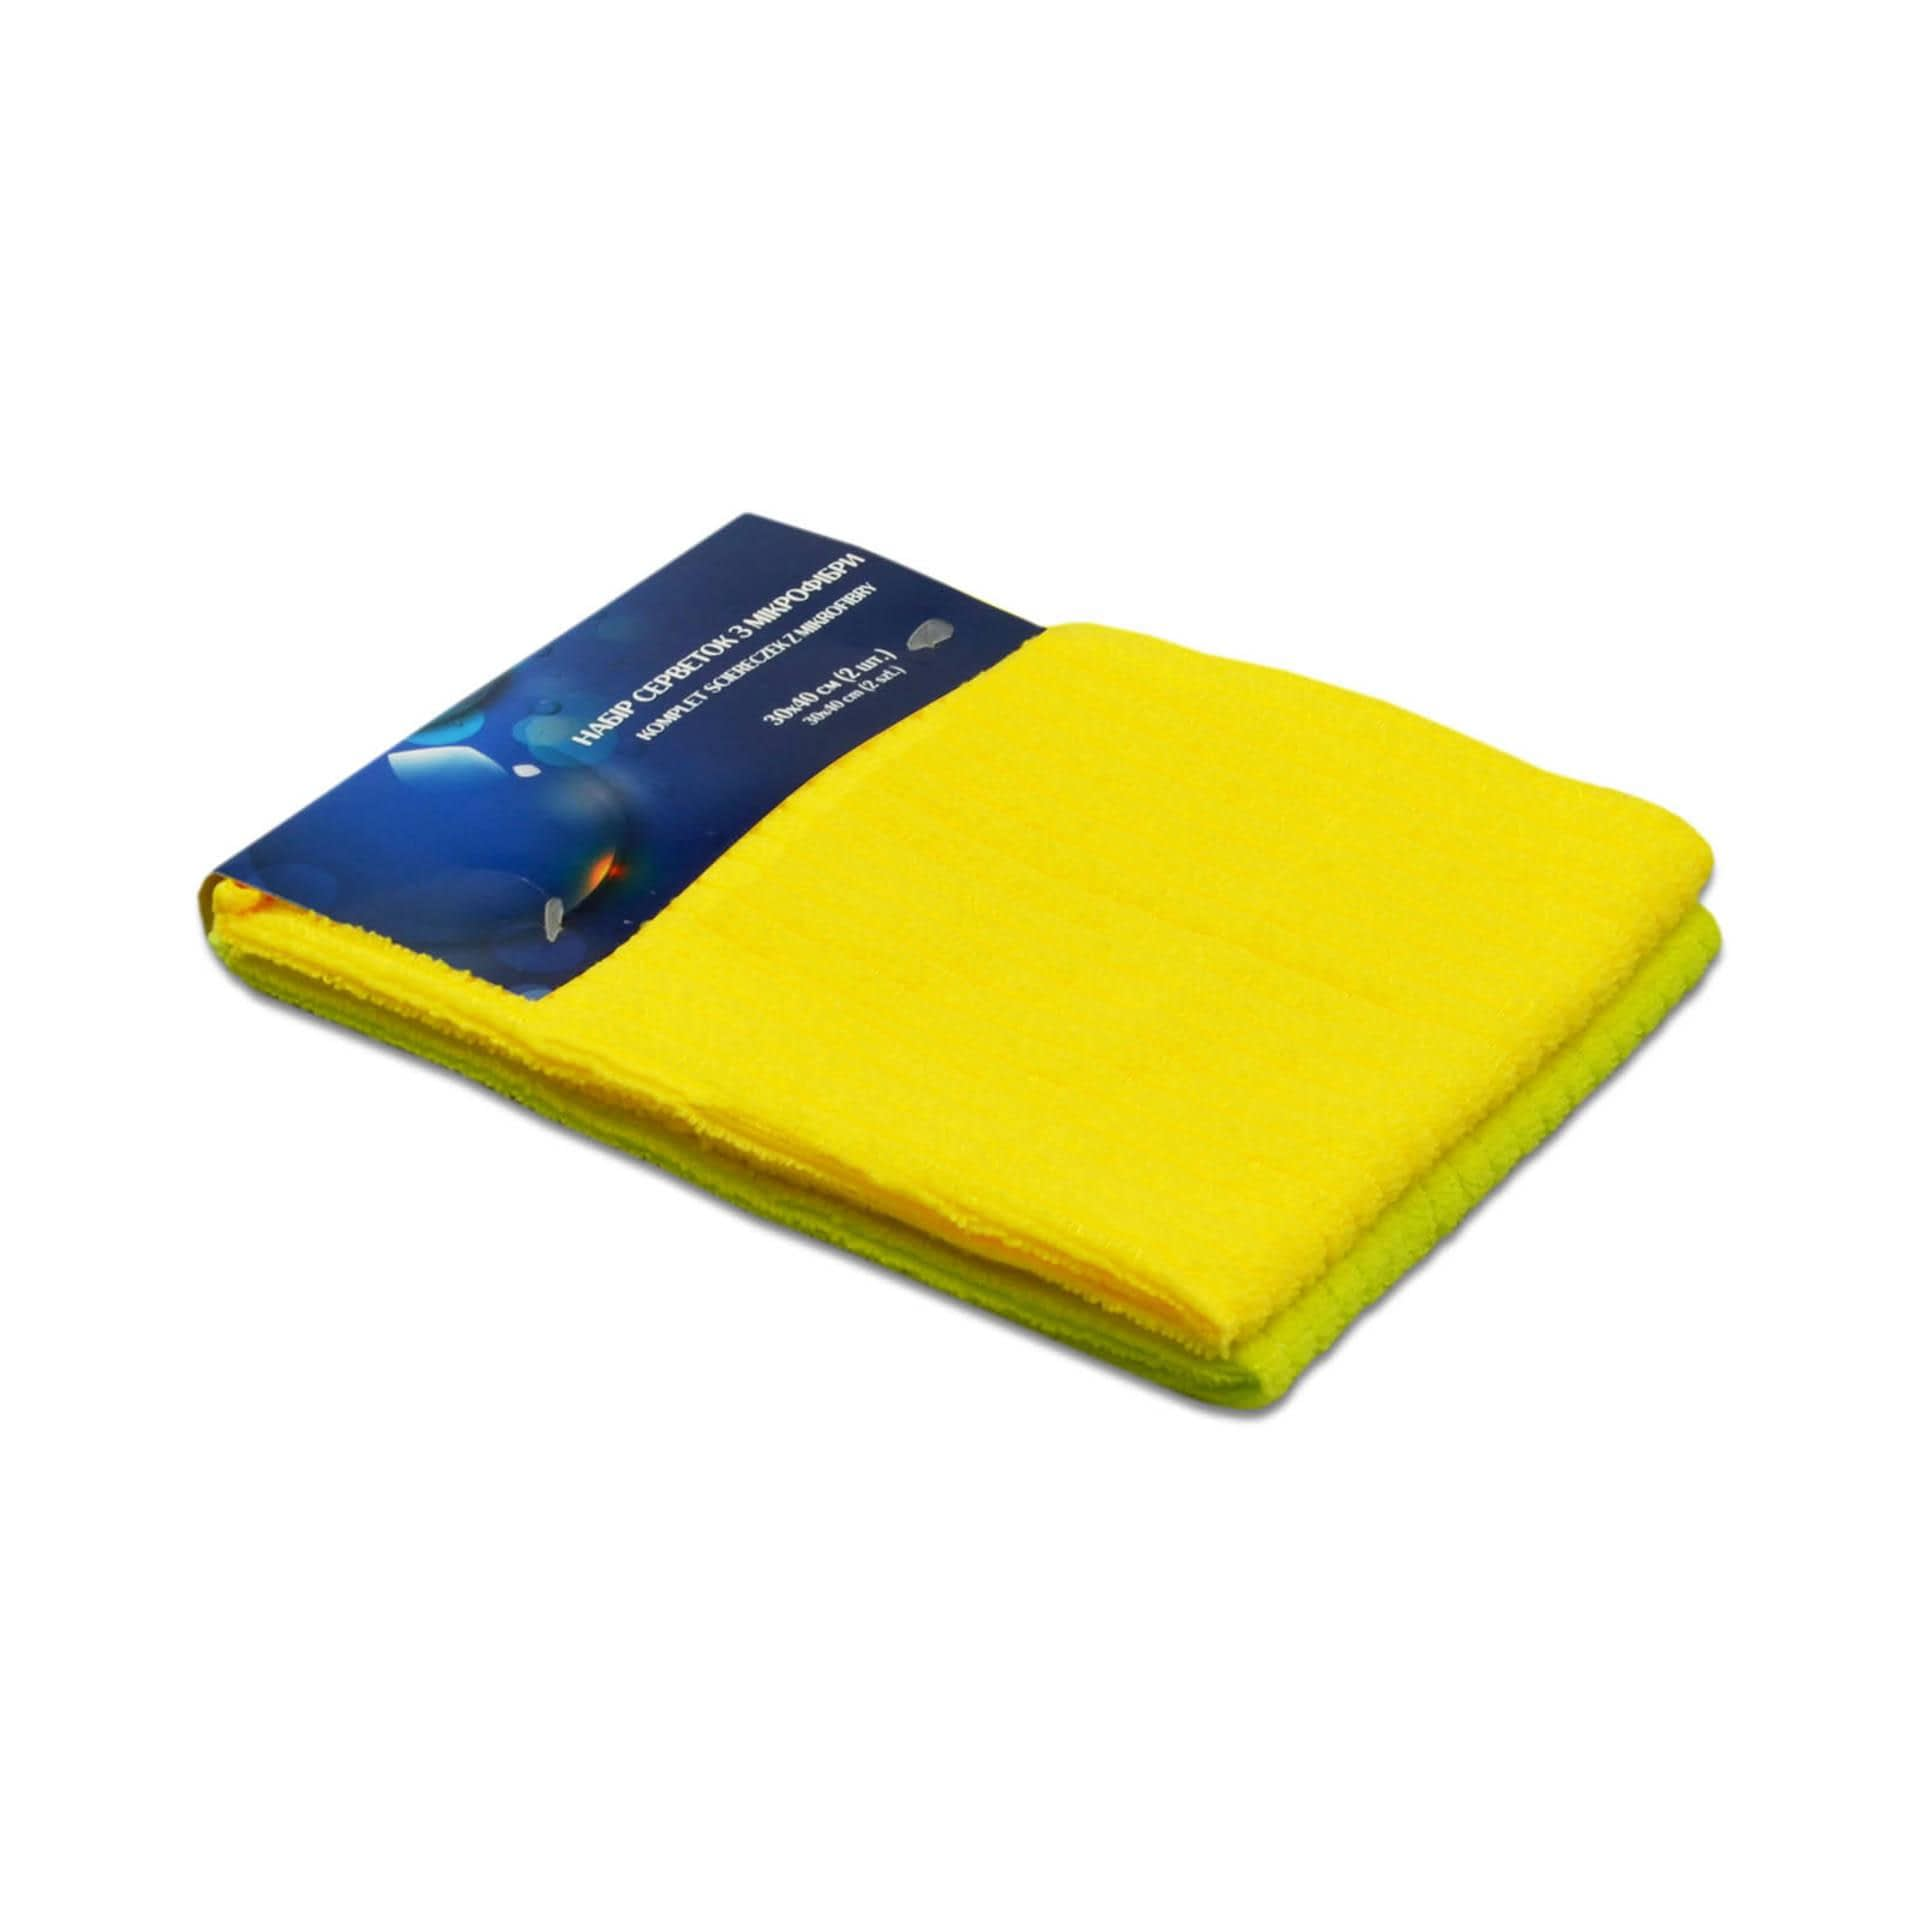 Ткани кухонные полотенца - Набор салфеток кухонных микрофибра  жёлто-зелёные  30х40 см  2шт.